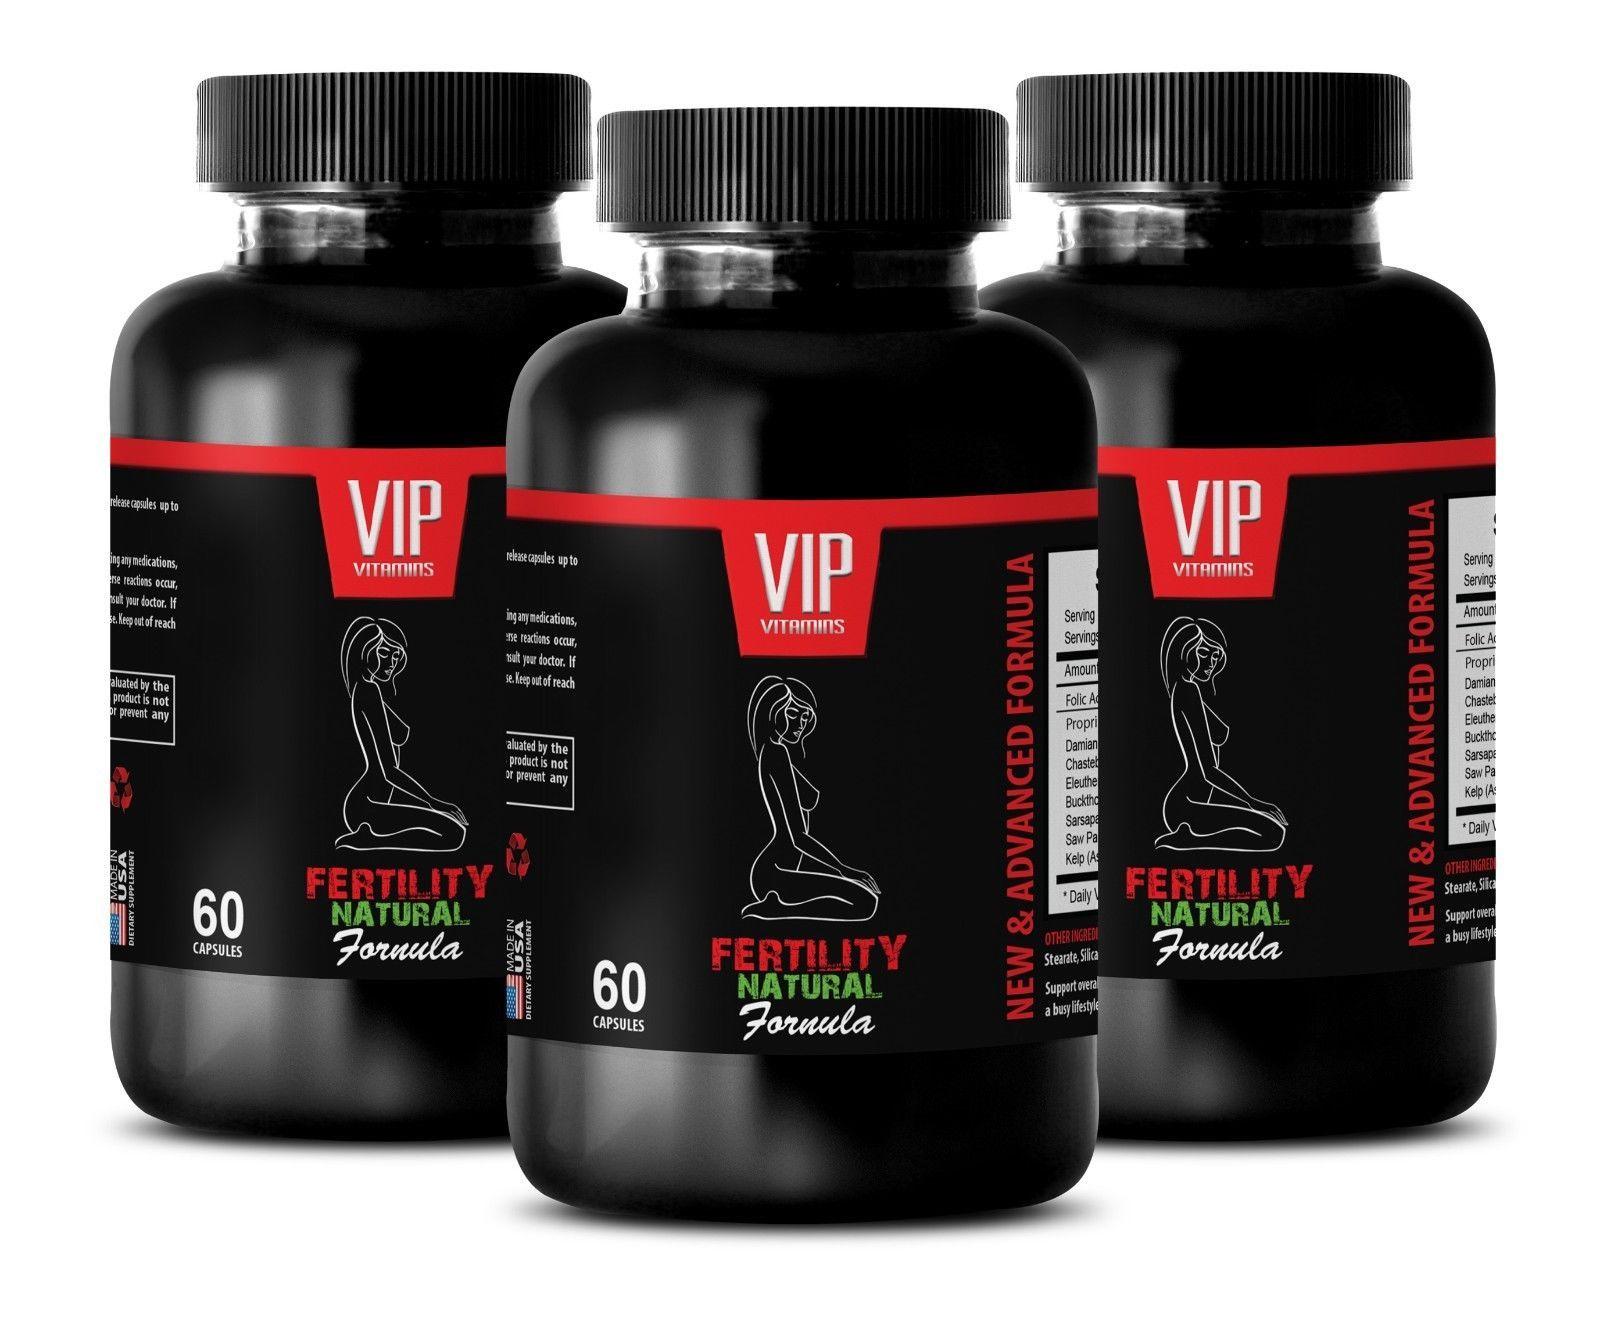 female sex enhancements pill FERTILITY COMPLEX NATURAL FORMULA damiana leave 3B - $37.36